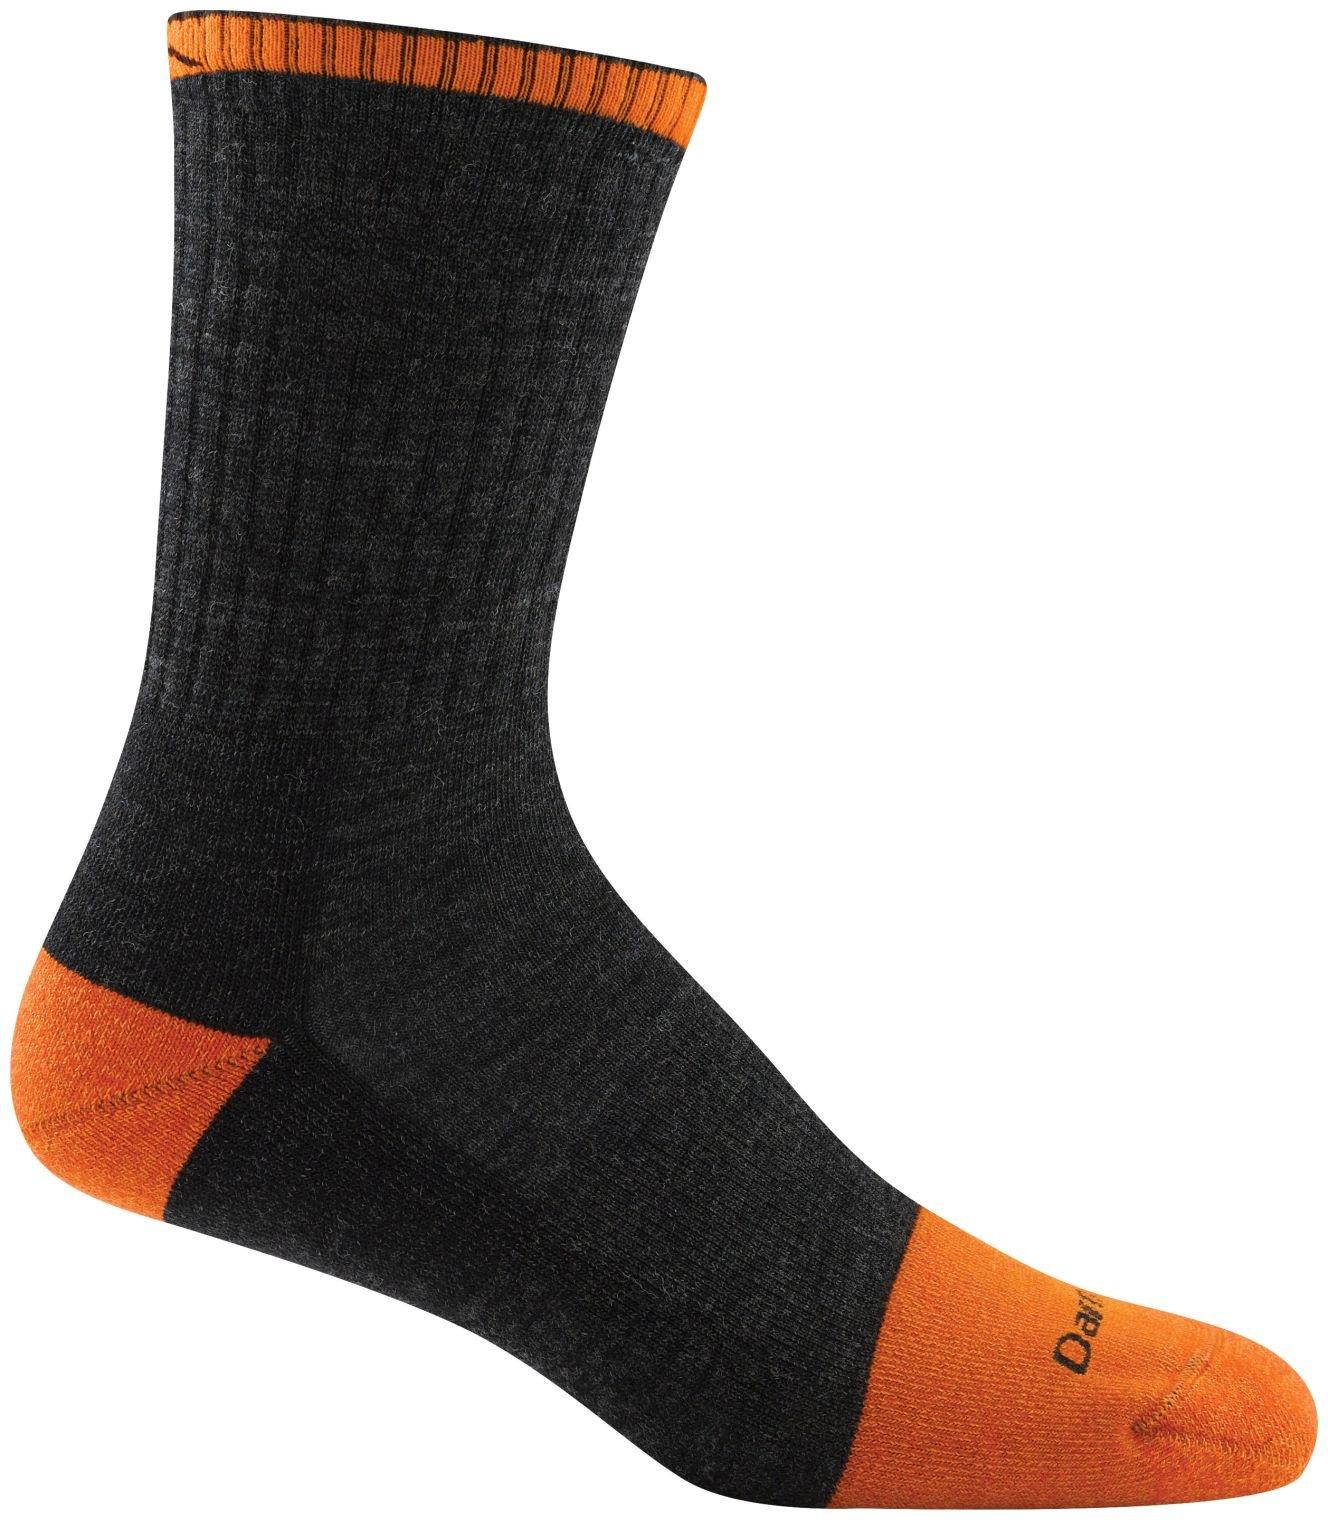 Darn Tough Steely Micro Crew Cushion Socks - Men's Graphite Medium by Darn Tough